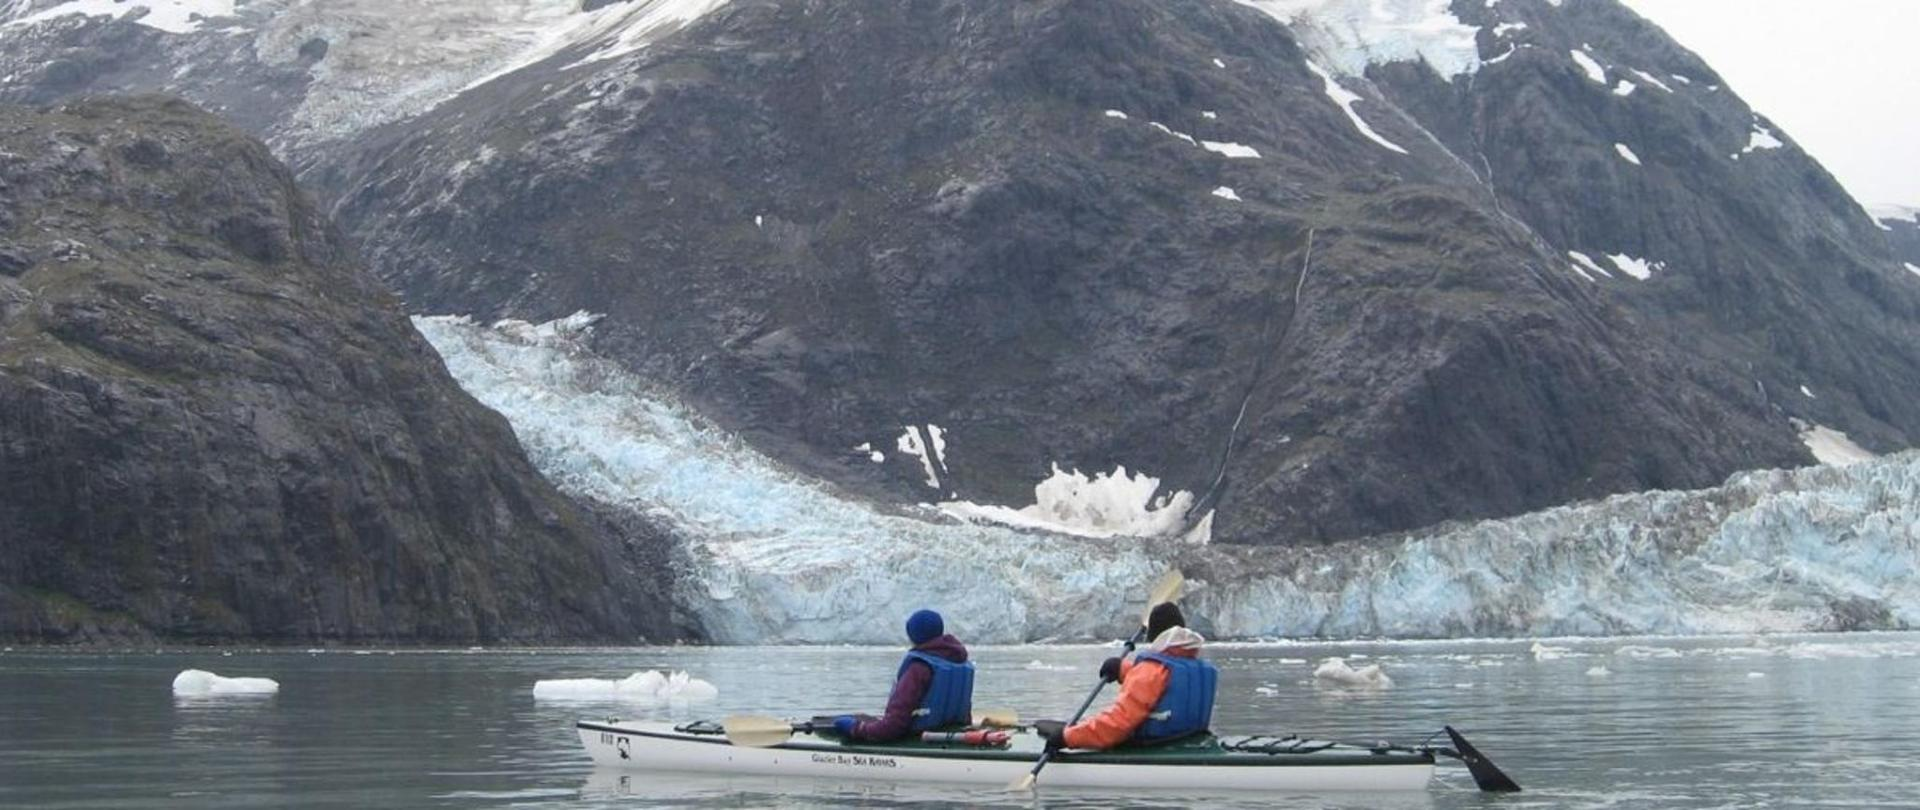 glba-sea-kayaksimg_4409b.jpeg